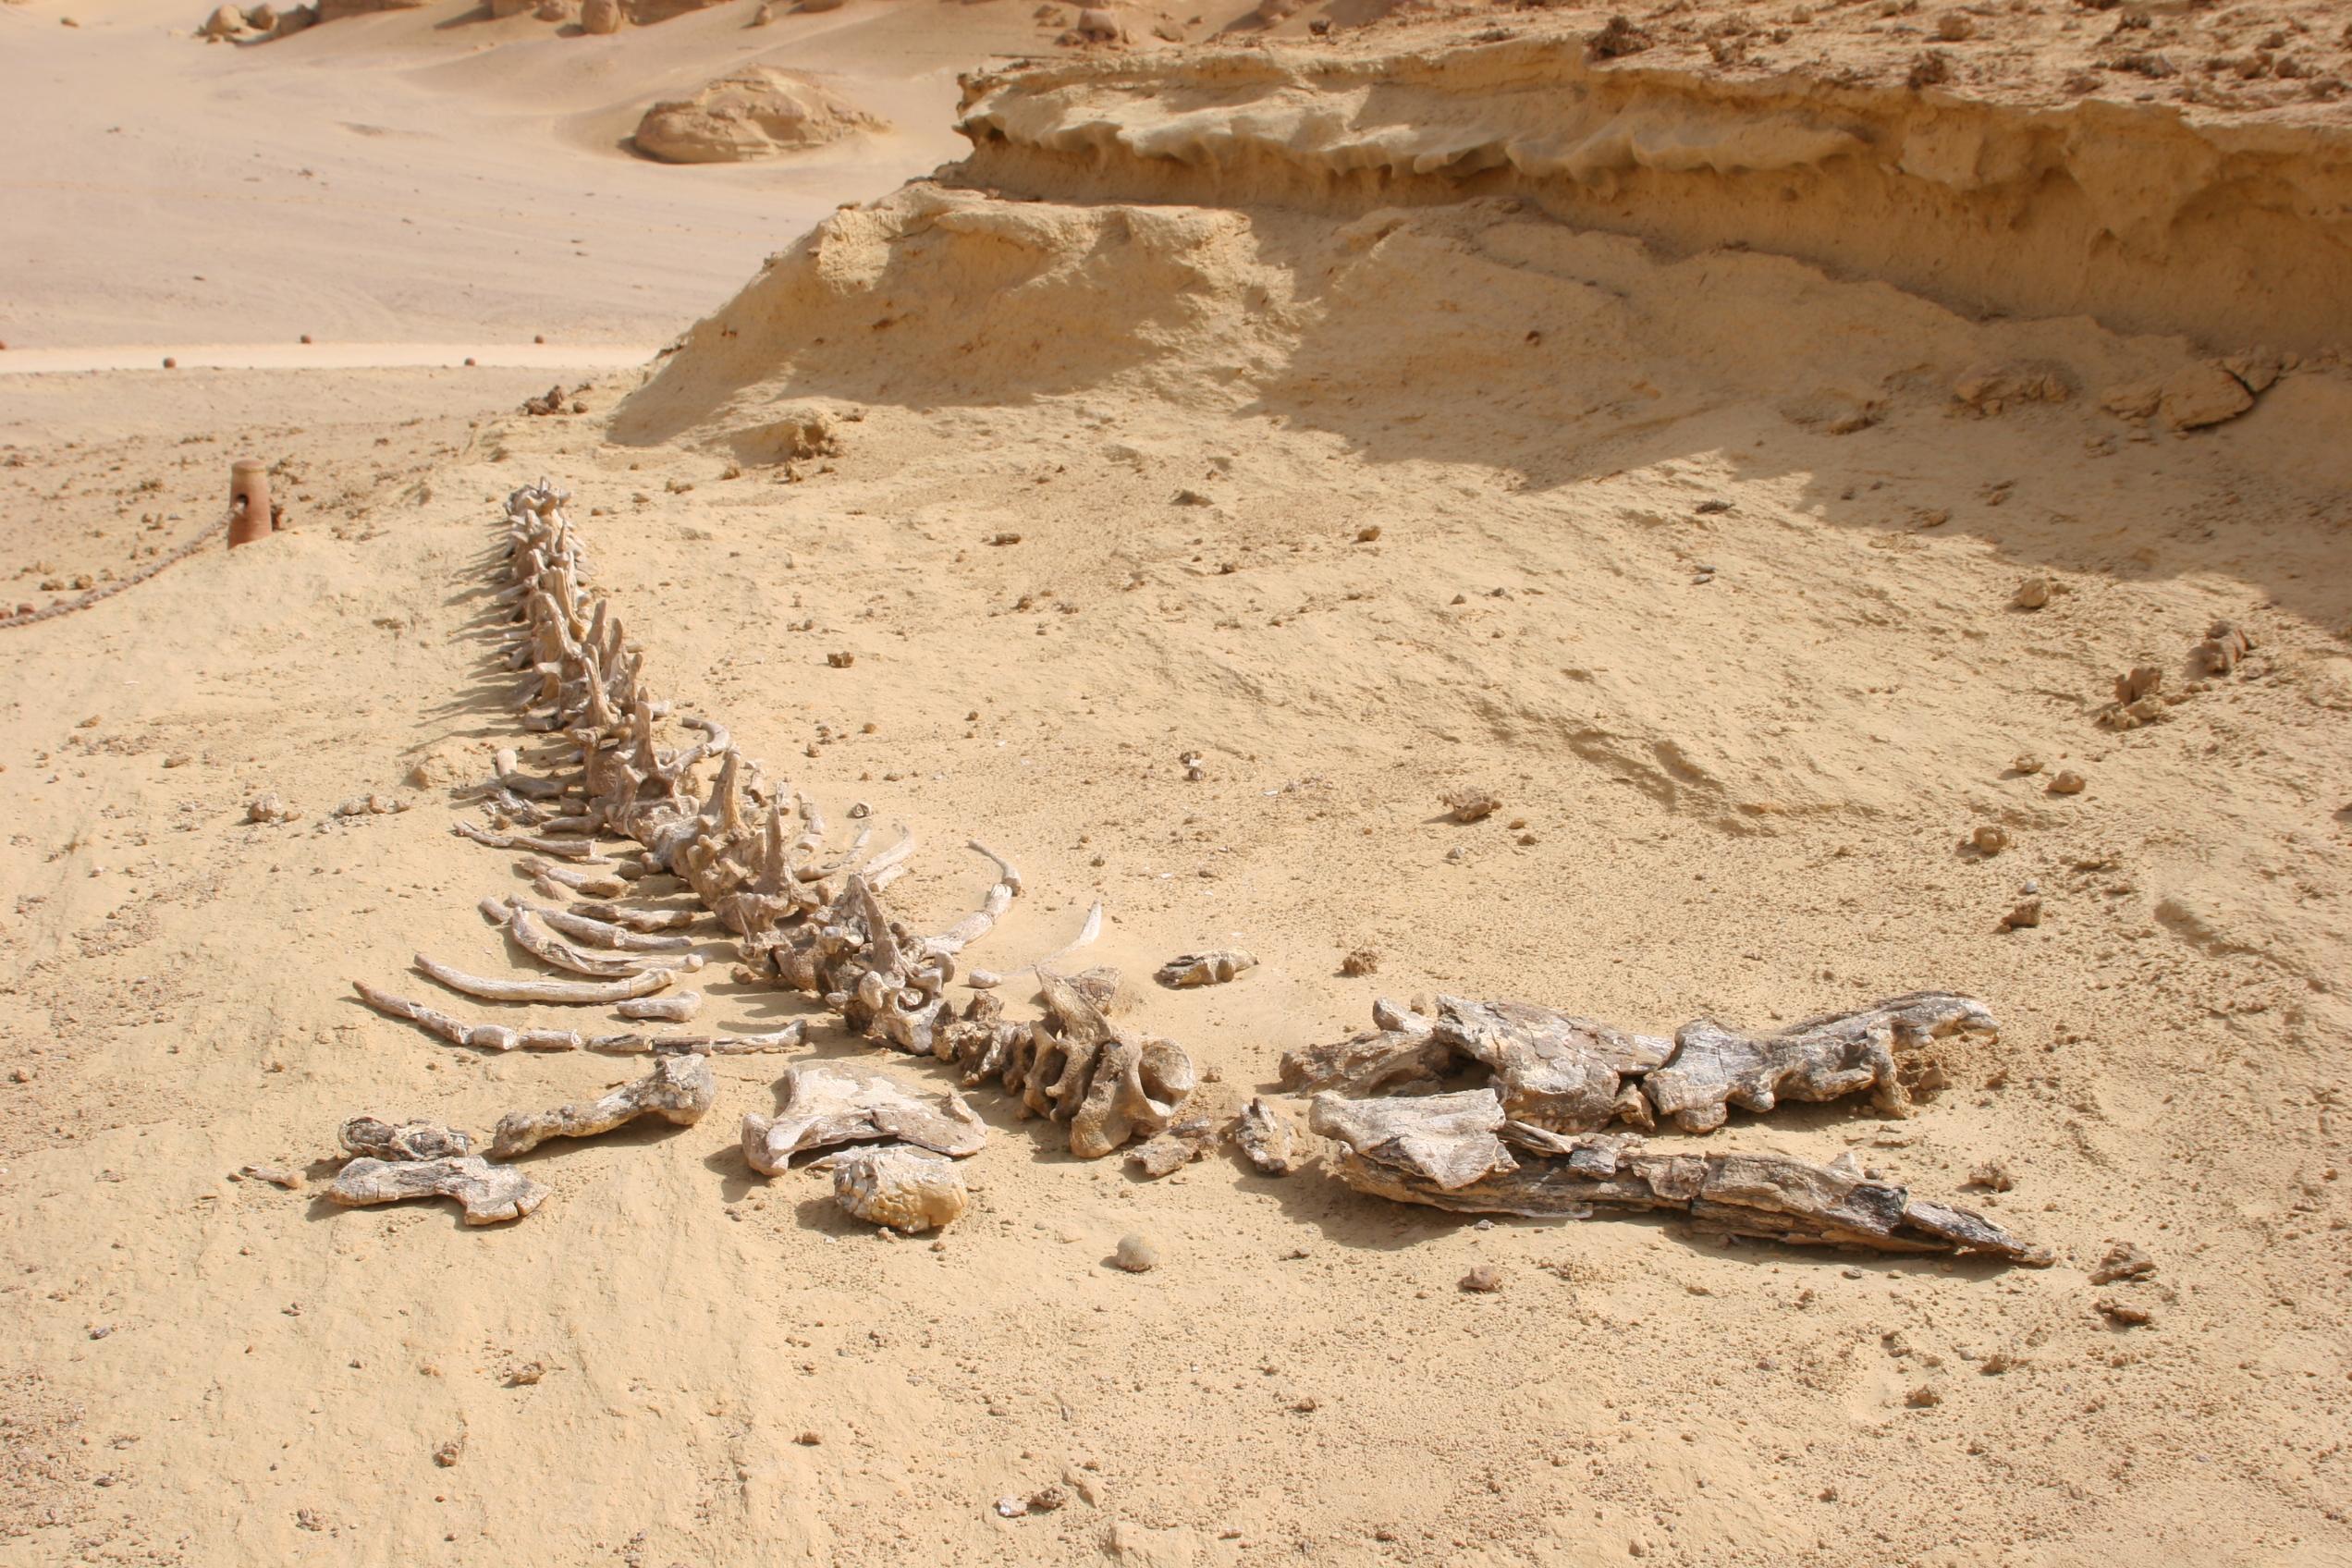 В Египте обнаружили останки ранее неизвестного предка кита с четырьмя конечностями